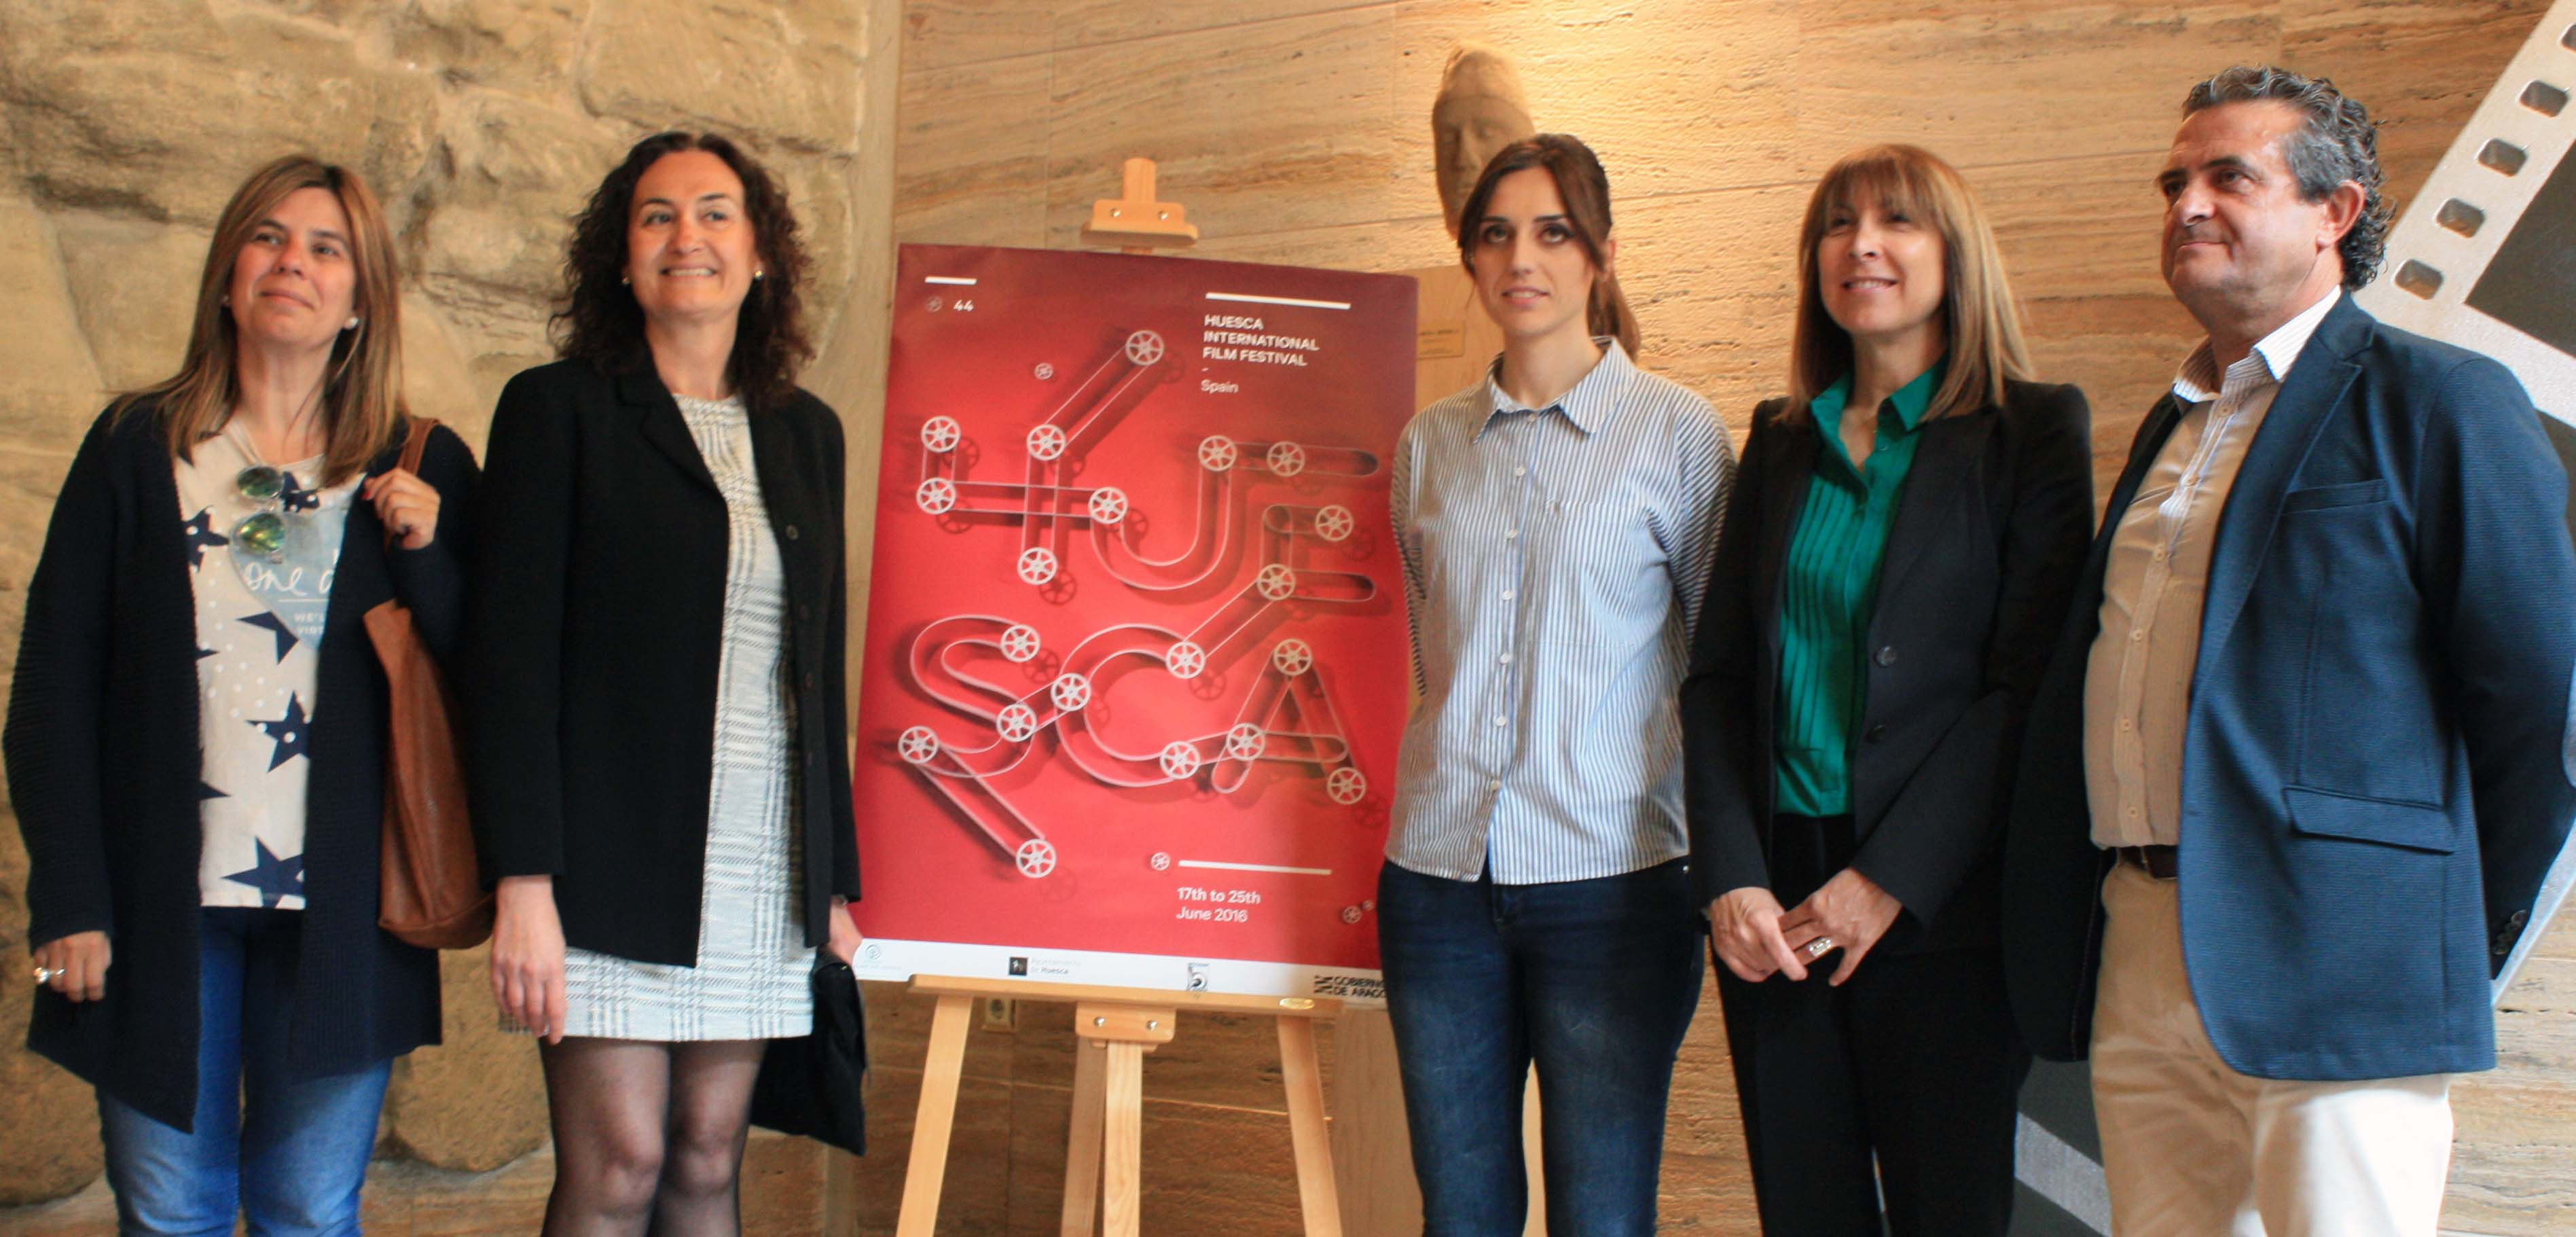 Presentación del Festival de Cine de Huesca 2016